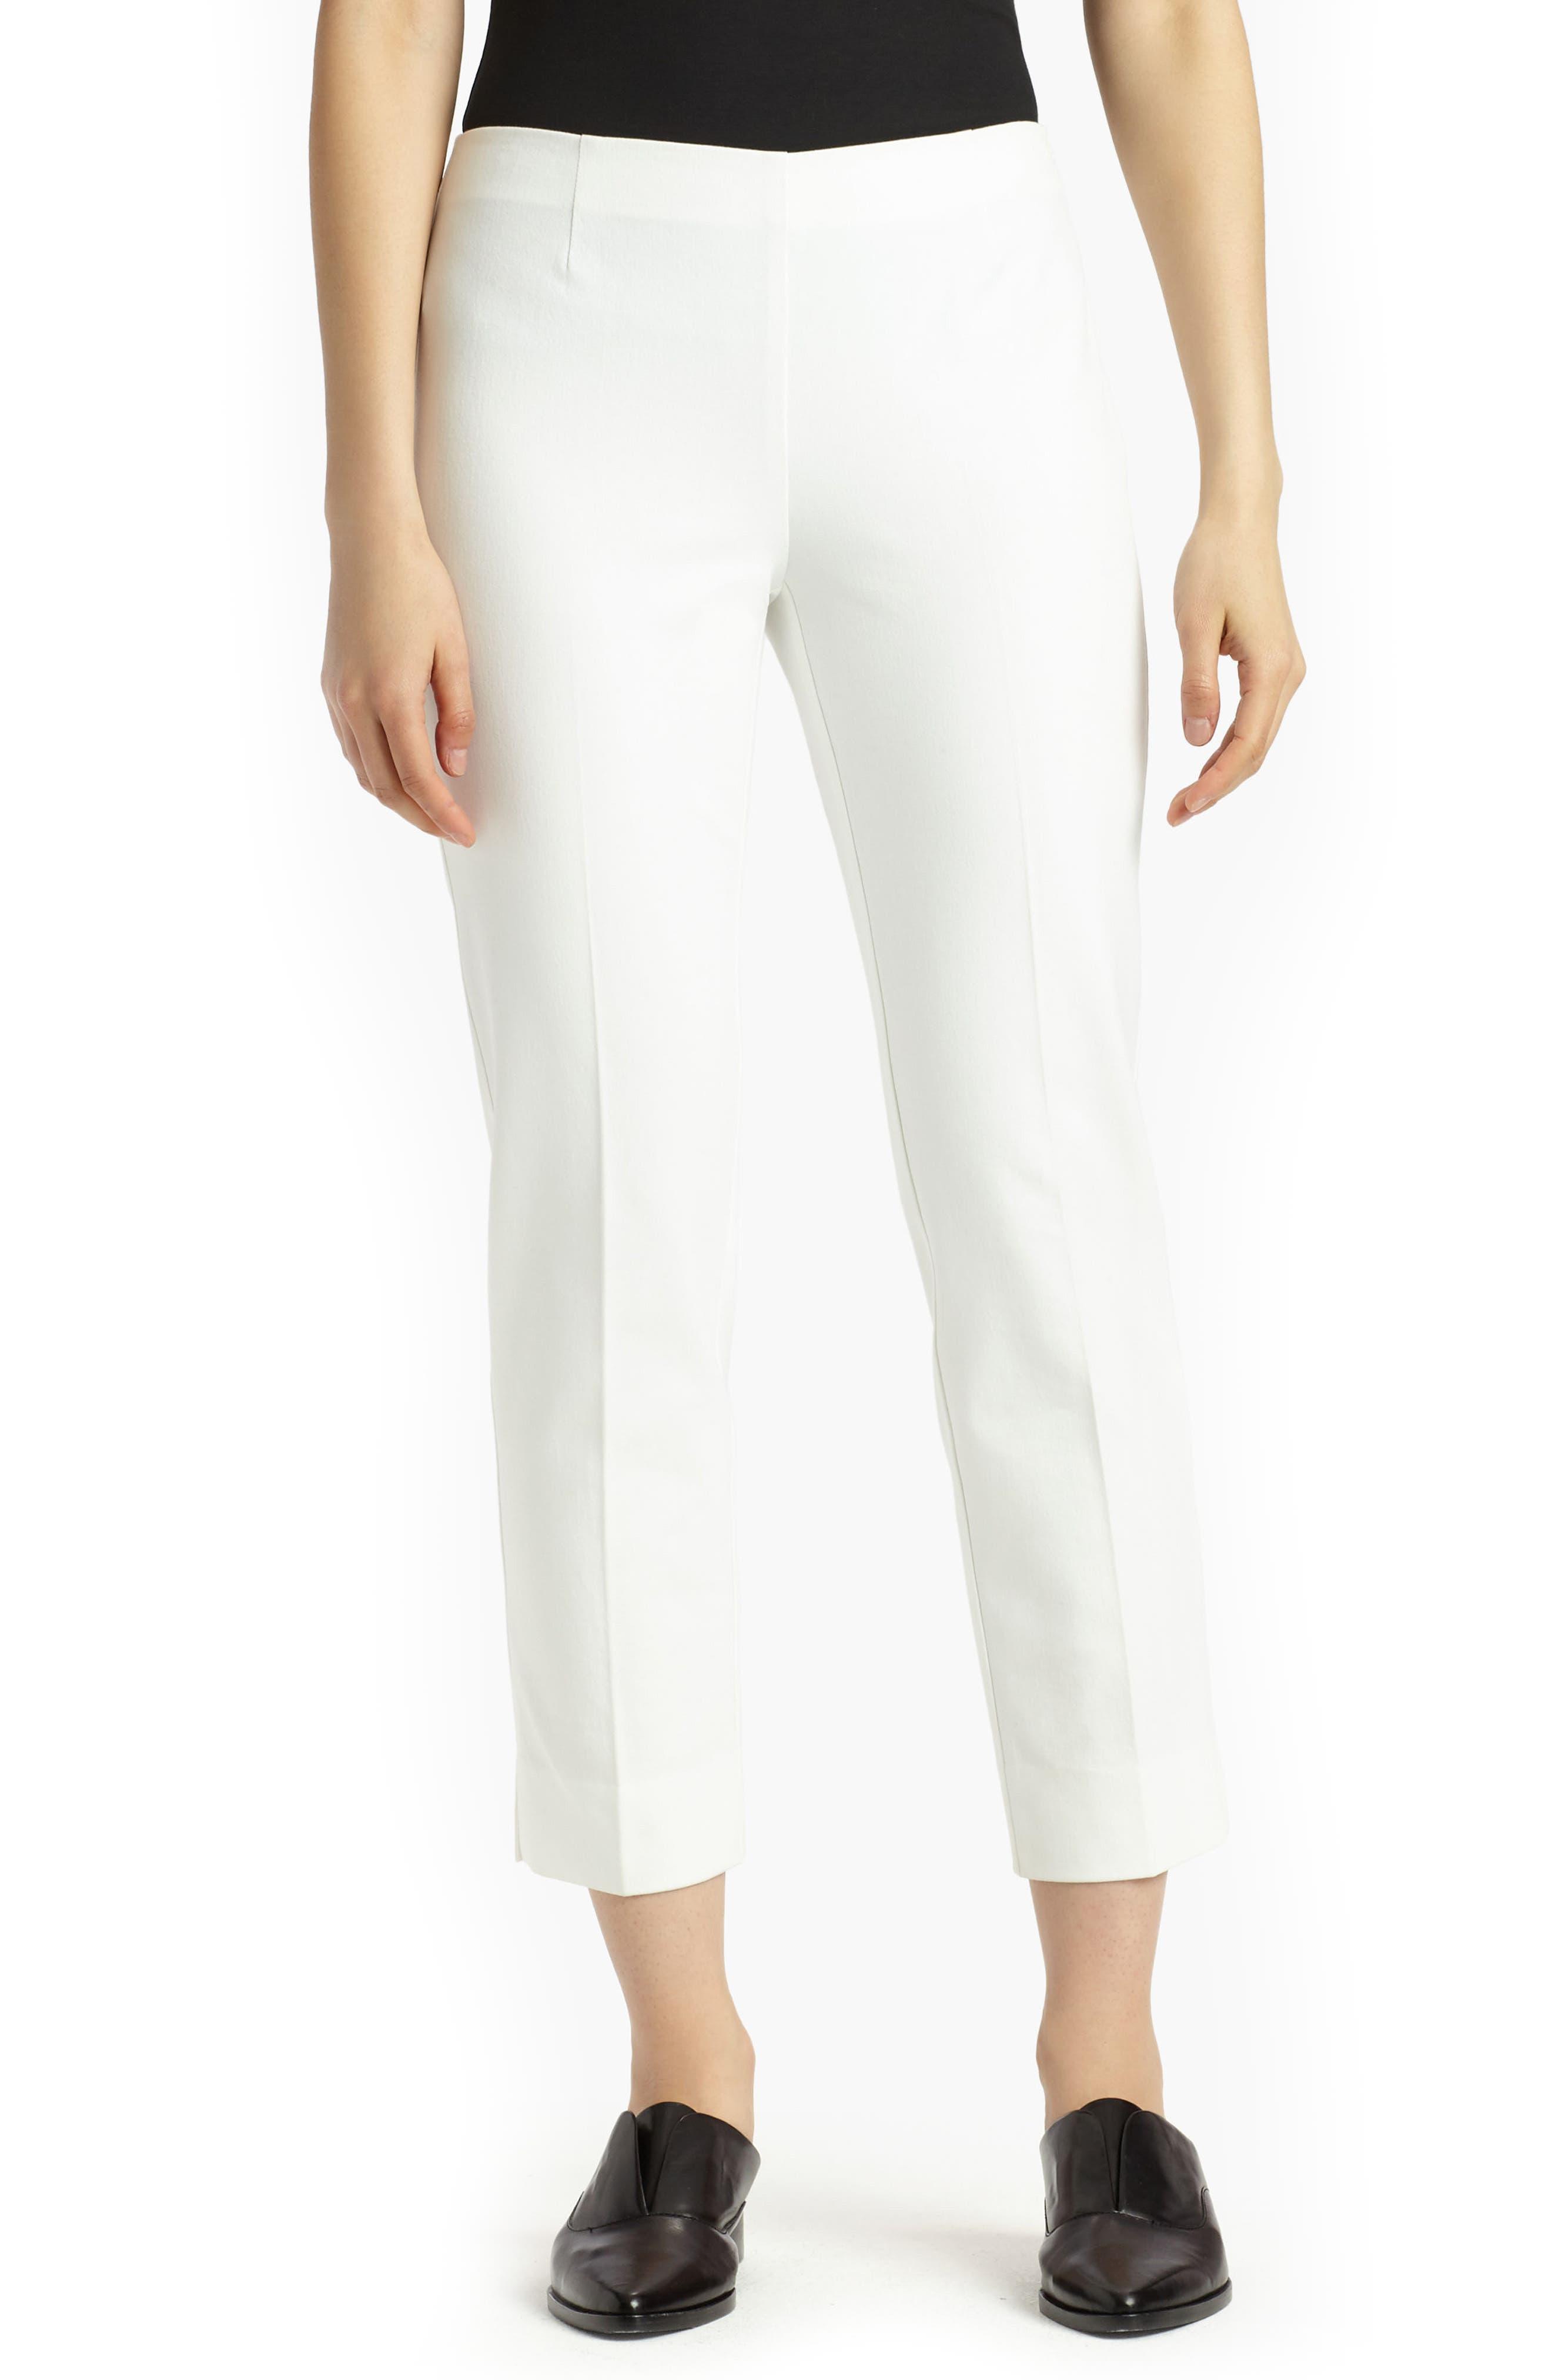 Jodhpur Cloth Cropped Lexington Pants in White